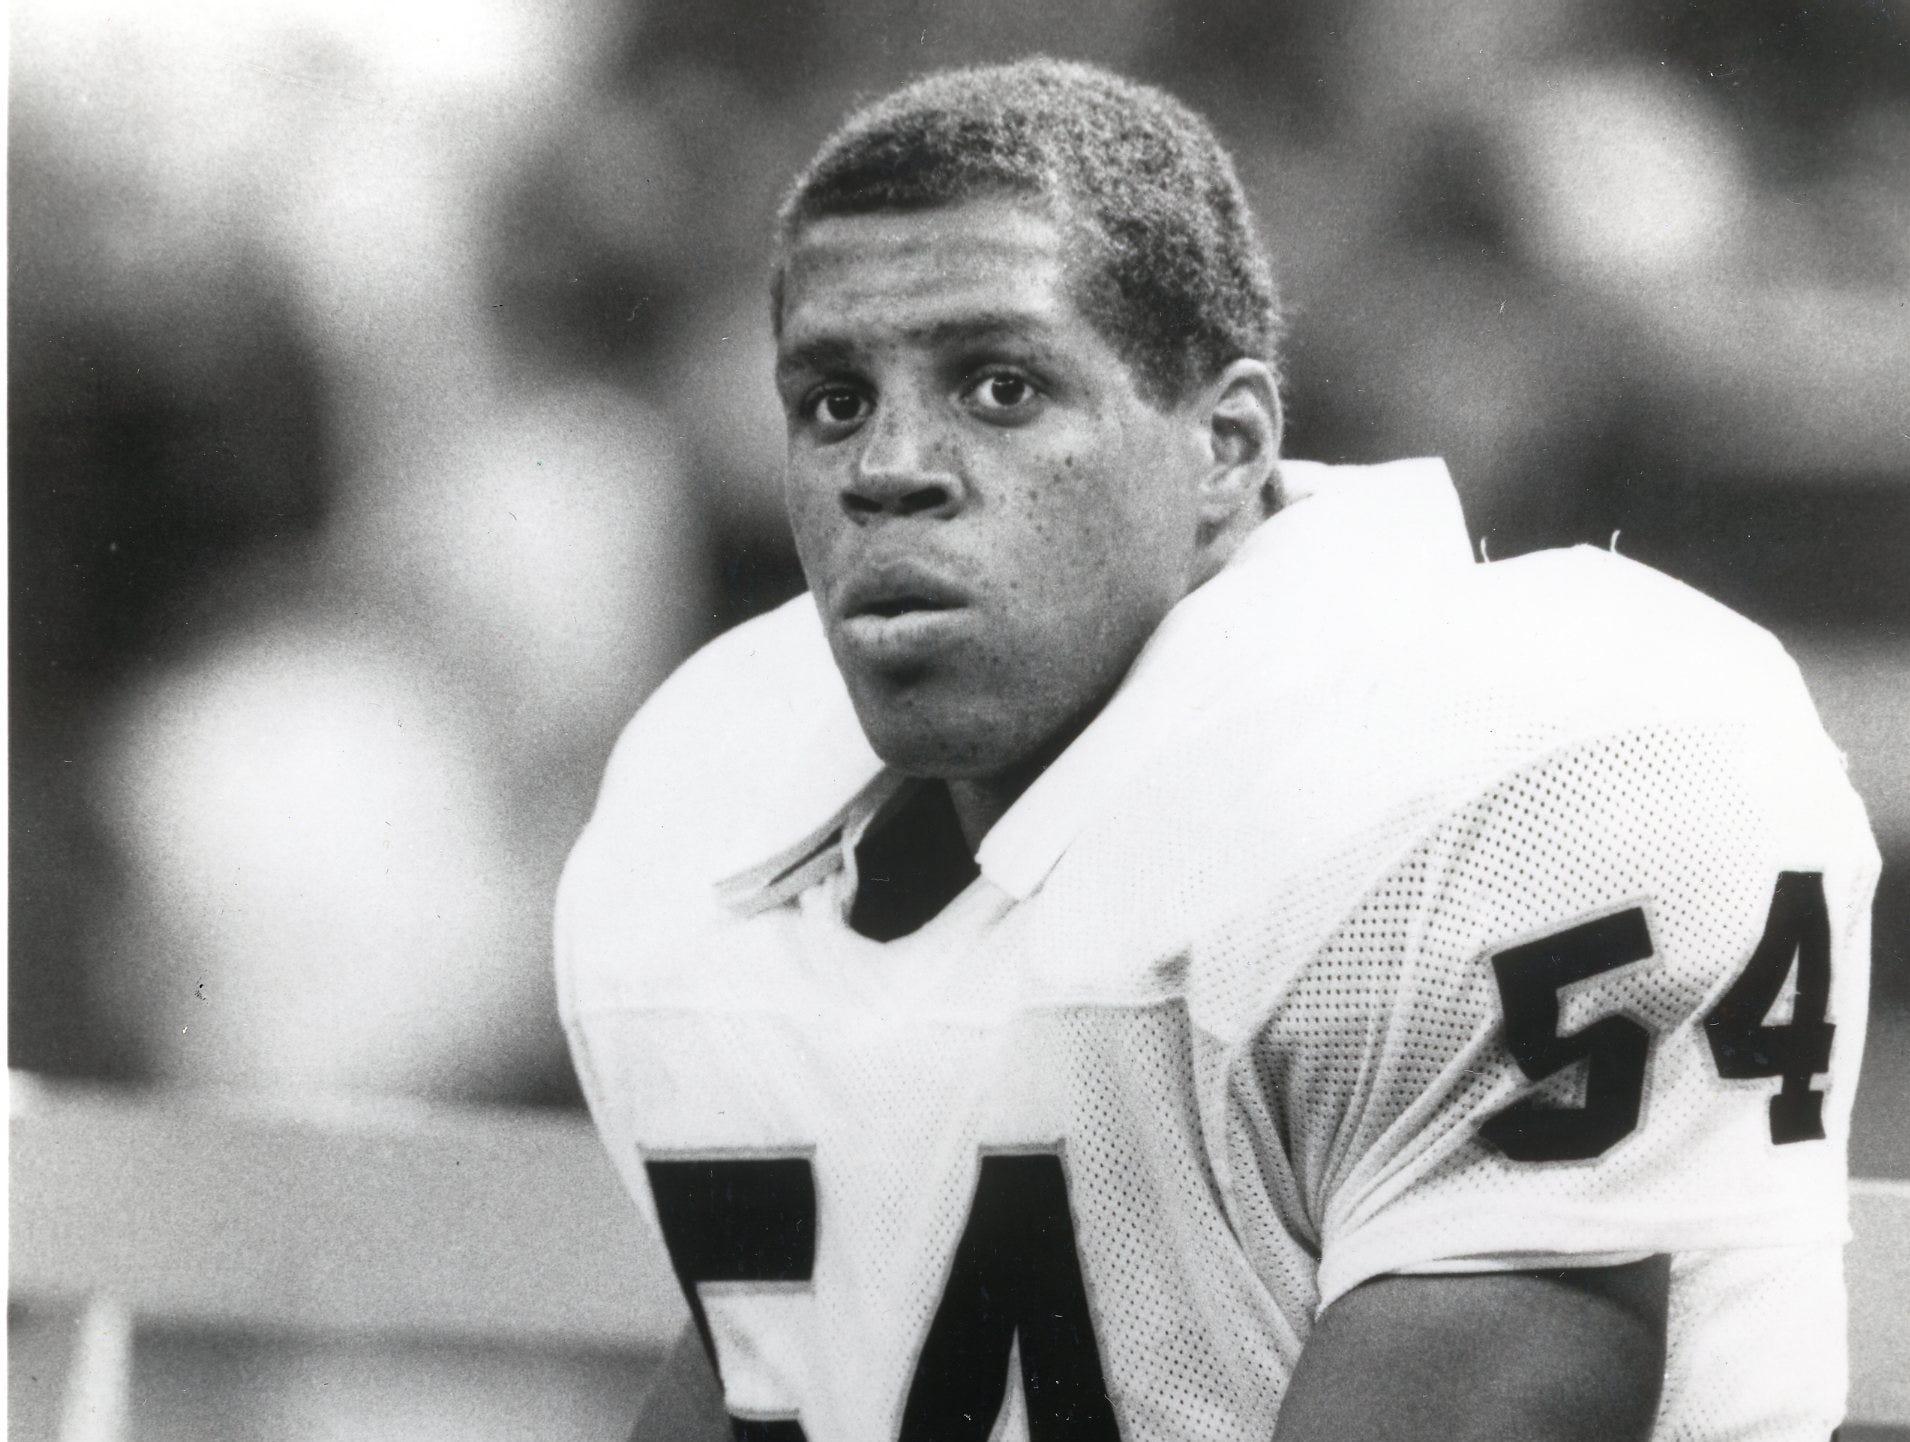 Reggie McKenzie in a 1990 Los Angeles Raiders photo.